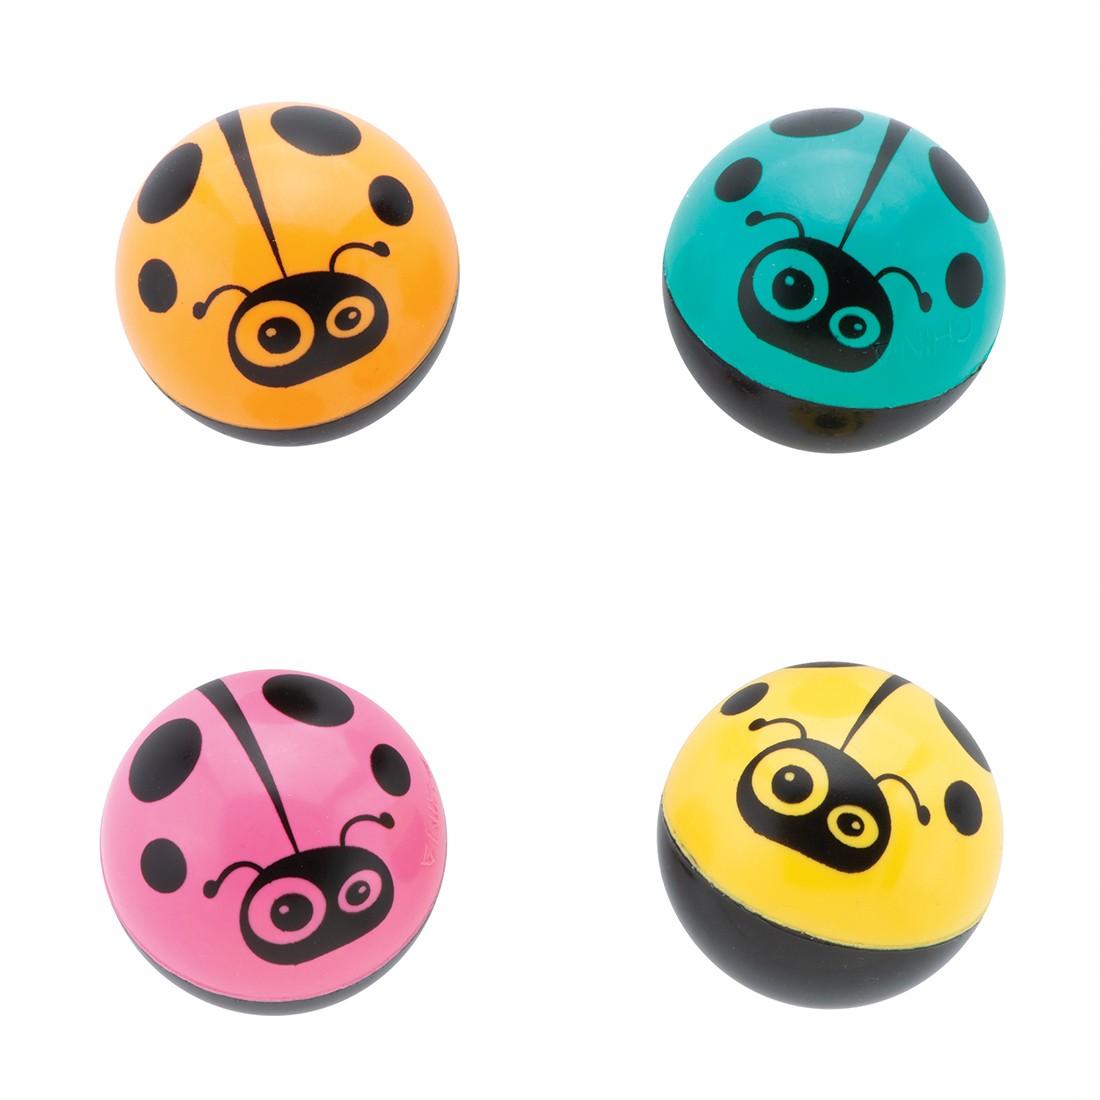 29mm Colorful Ladybug Bouncing Balls [image]